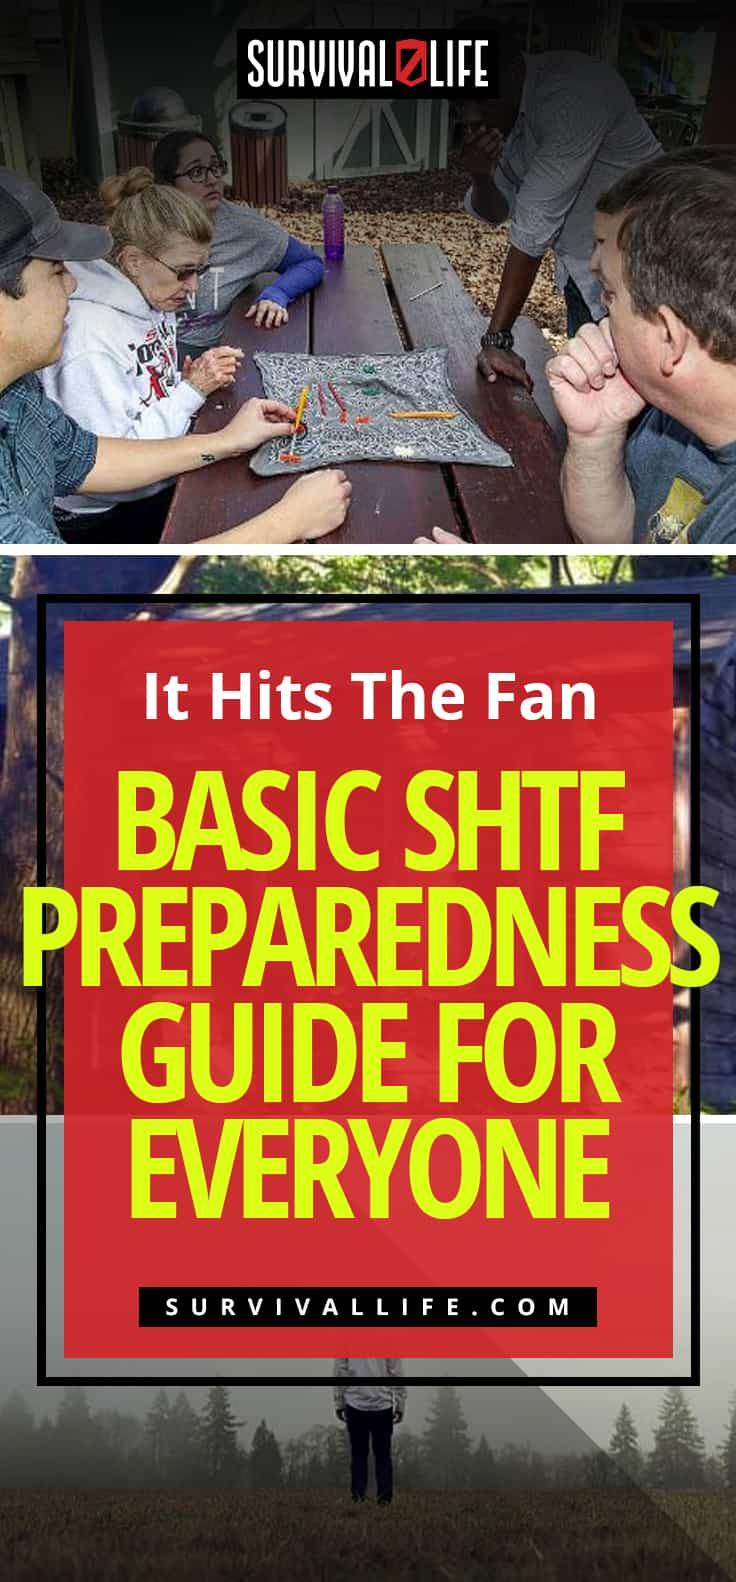 It Hits The Fan – Basic SHTF Preparedness Guide For Everyone